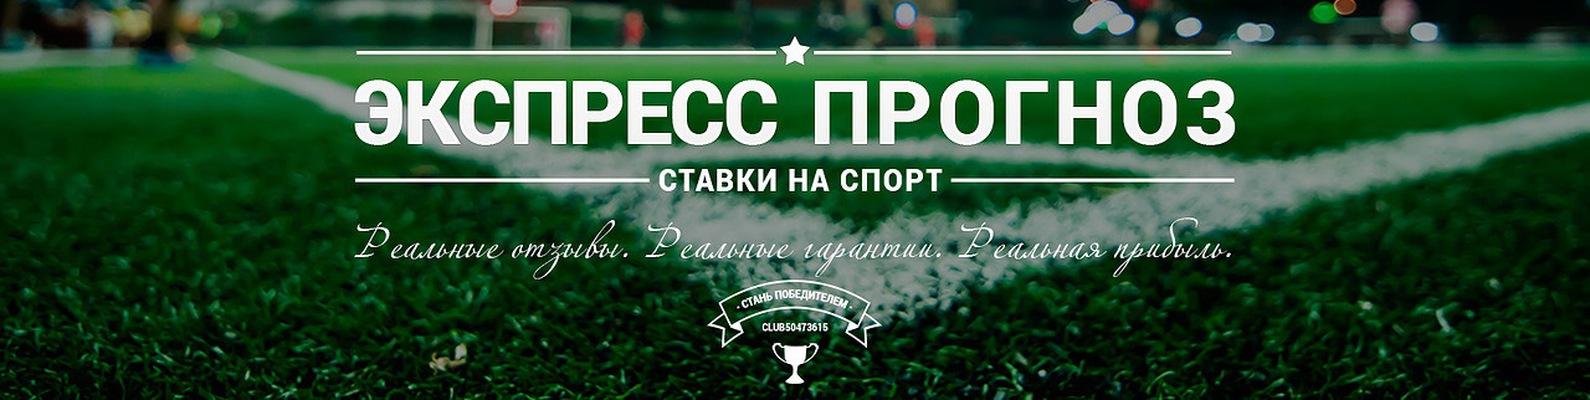 Фонбет ставки на кибер футбол в россии